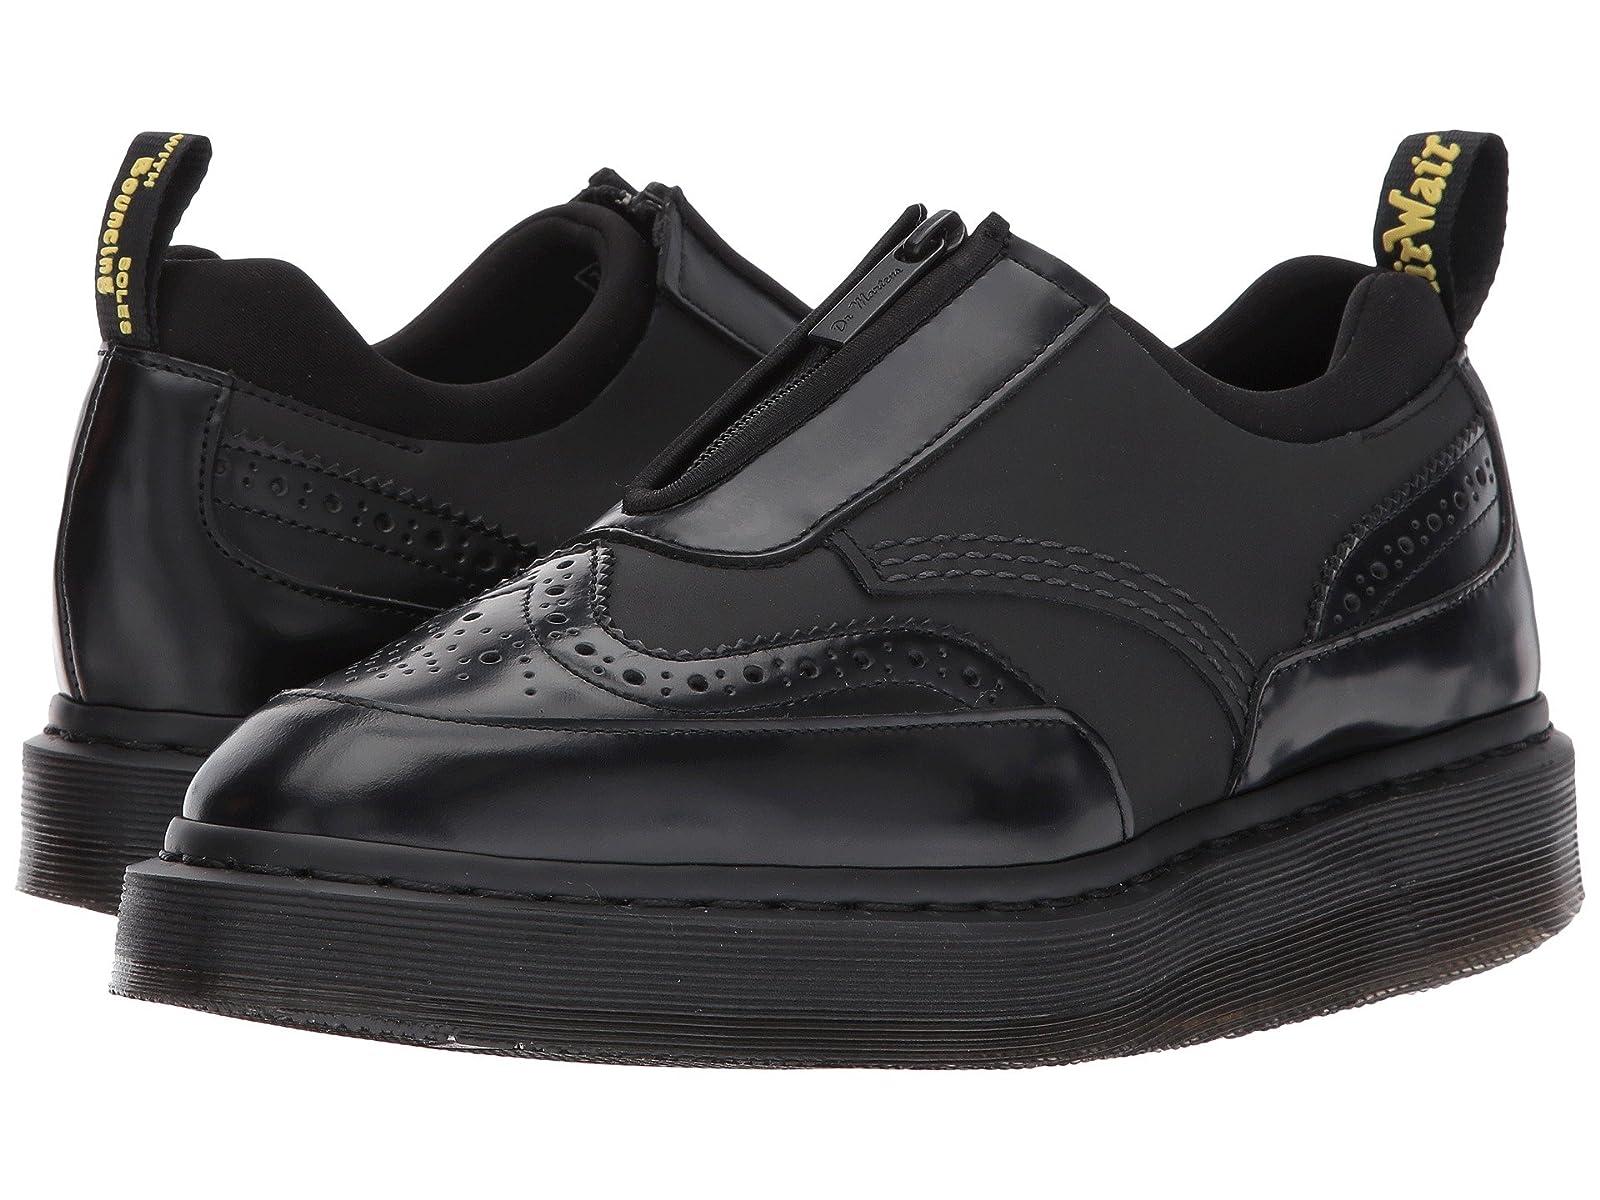 Dr. Martens Resnik Zip BrogueCheap and distinctive eye-catching shoes